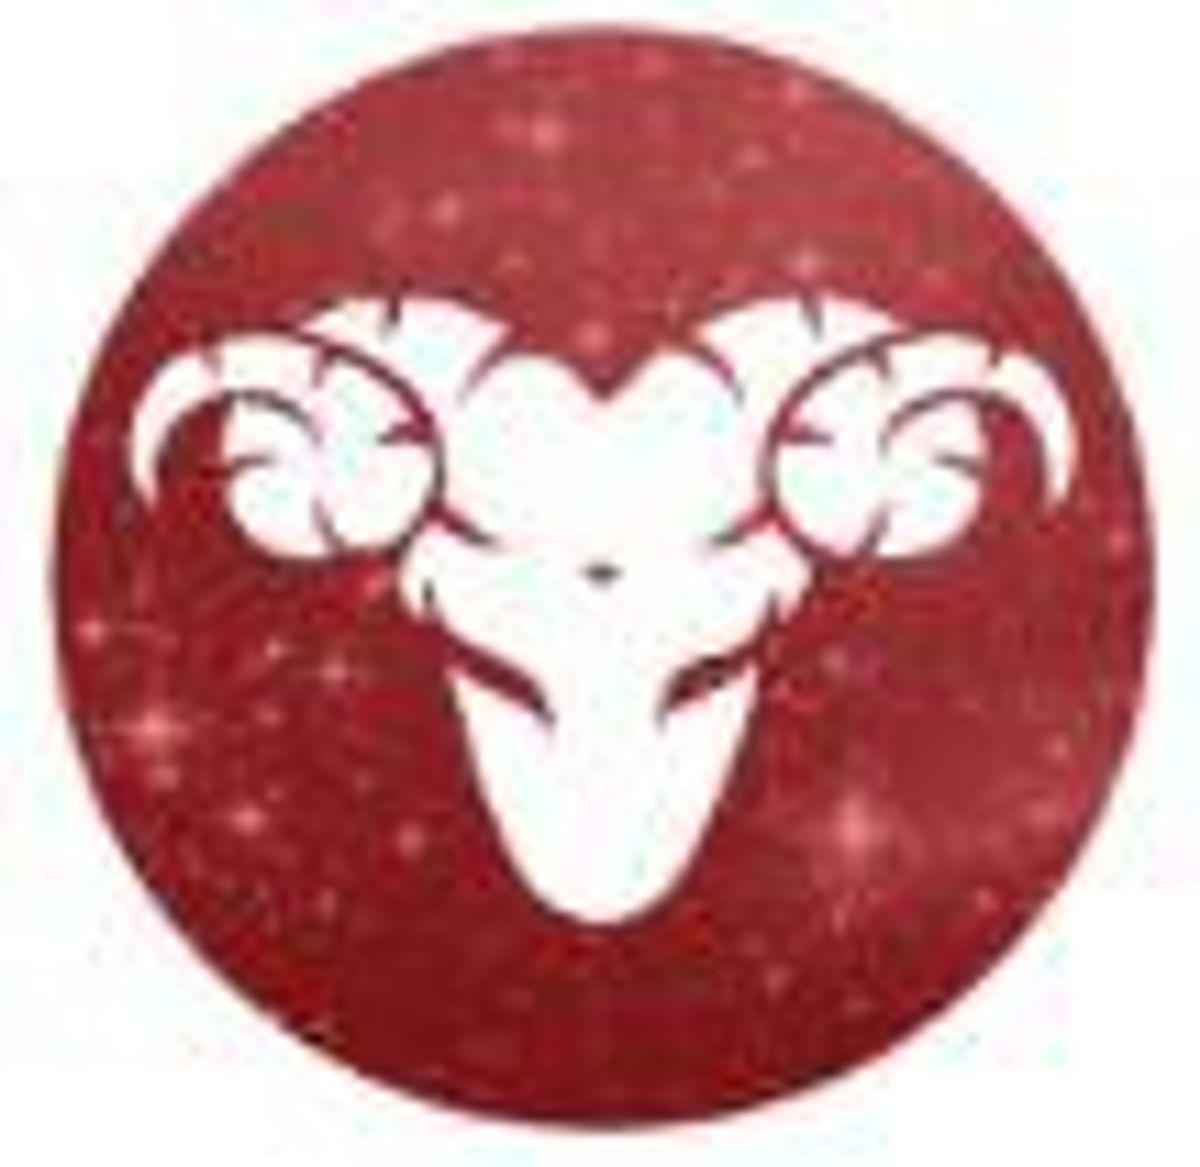 Aries: The Cardinal Fire Sign